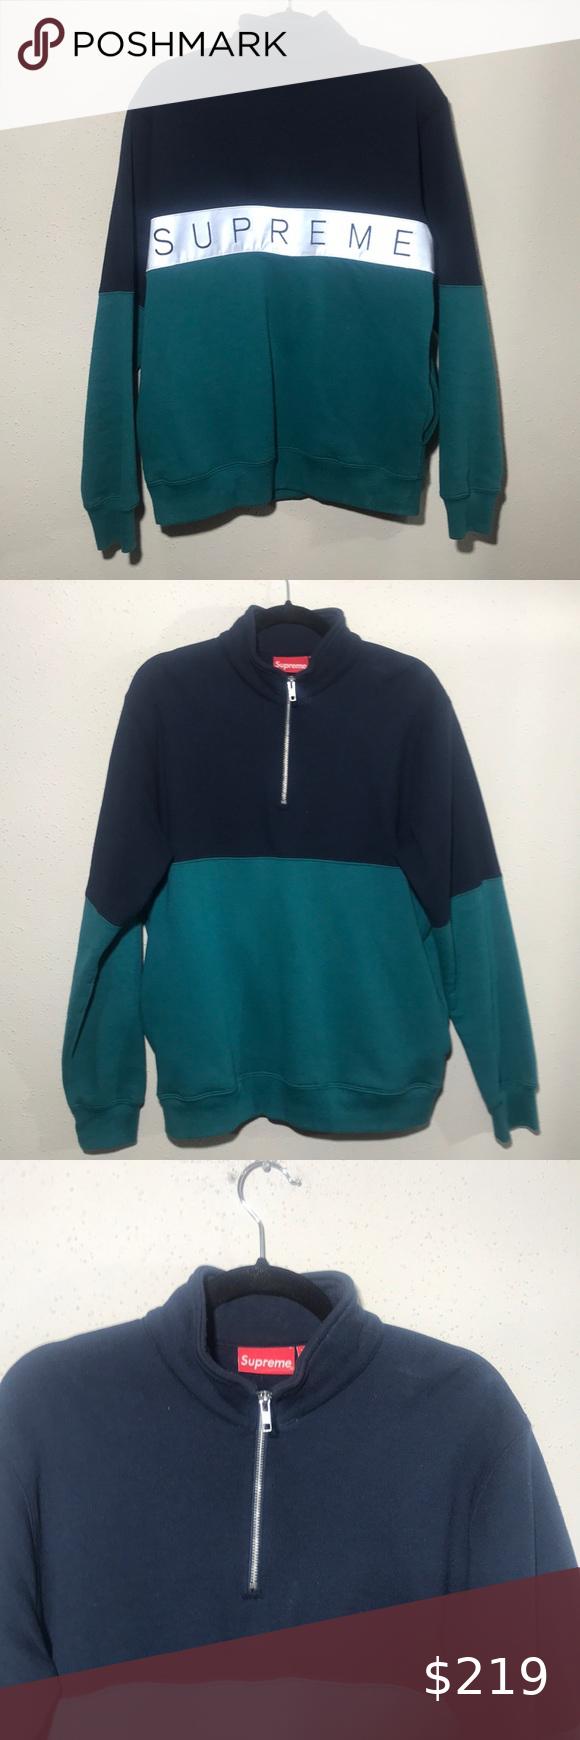 Supreme Back Spellout 3m Medium Sweater Crew Neck Sweater Men Supreme Sweater Black Supreme Hoodie [ 1740 x 580 Pixel ]